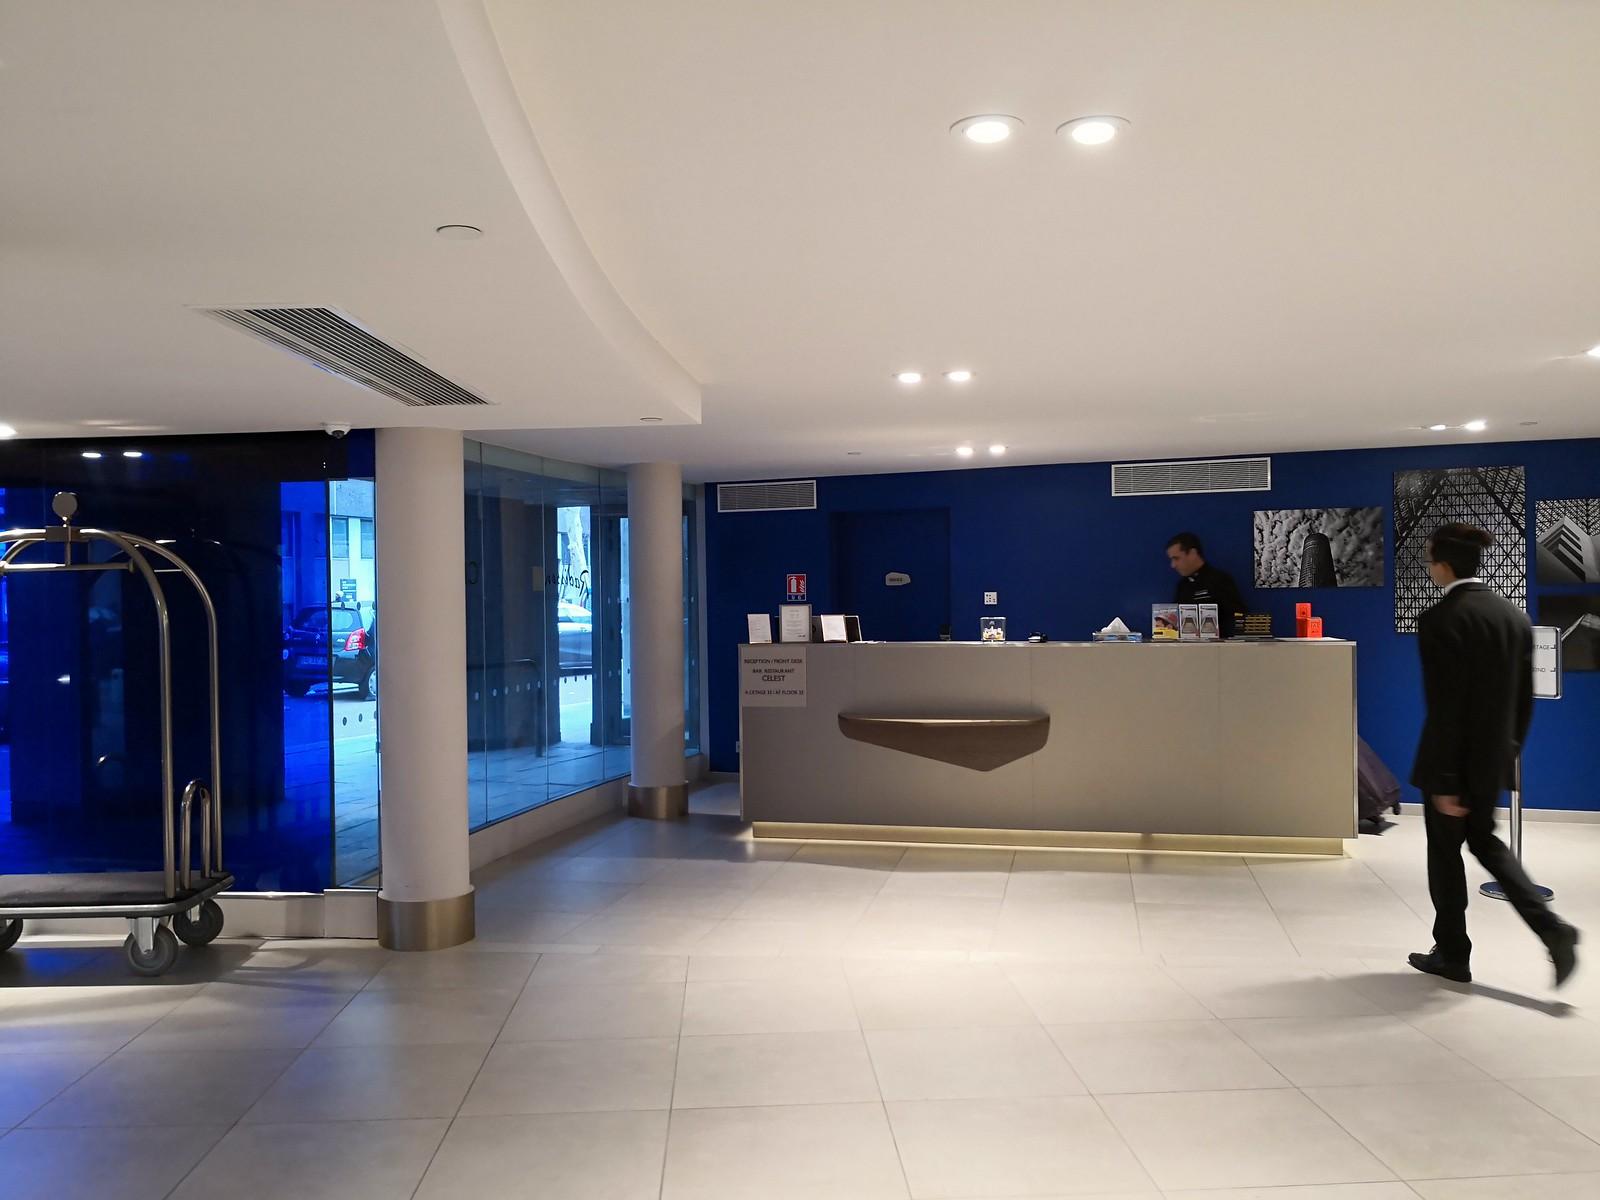 Concierge desk on the ground floor